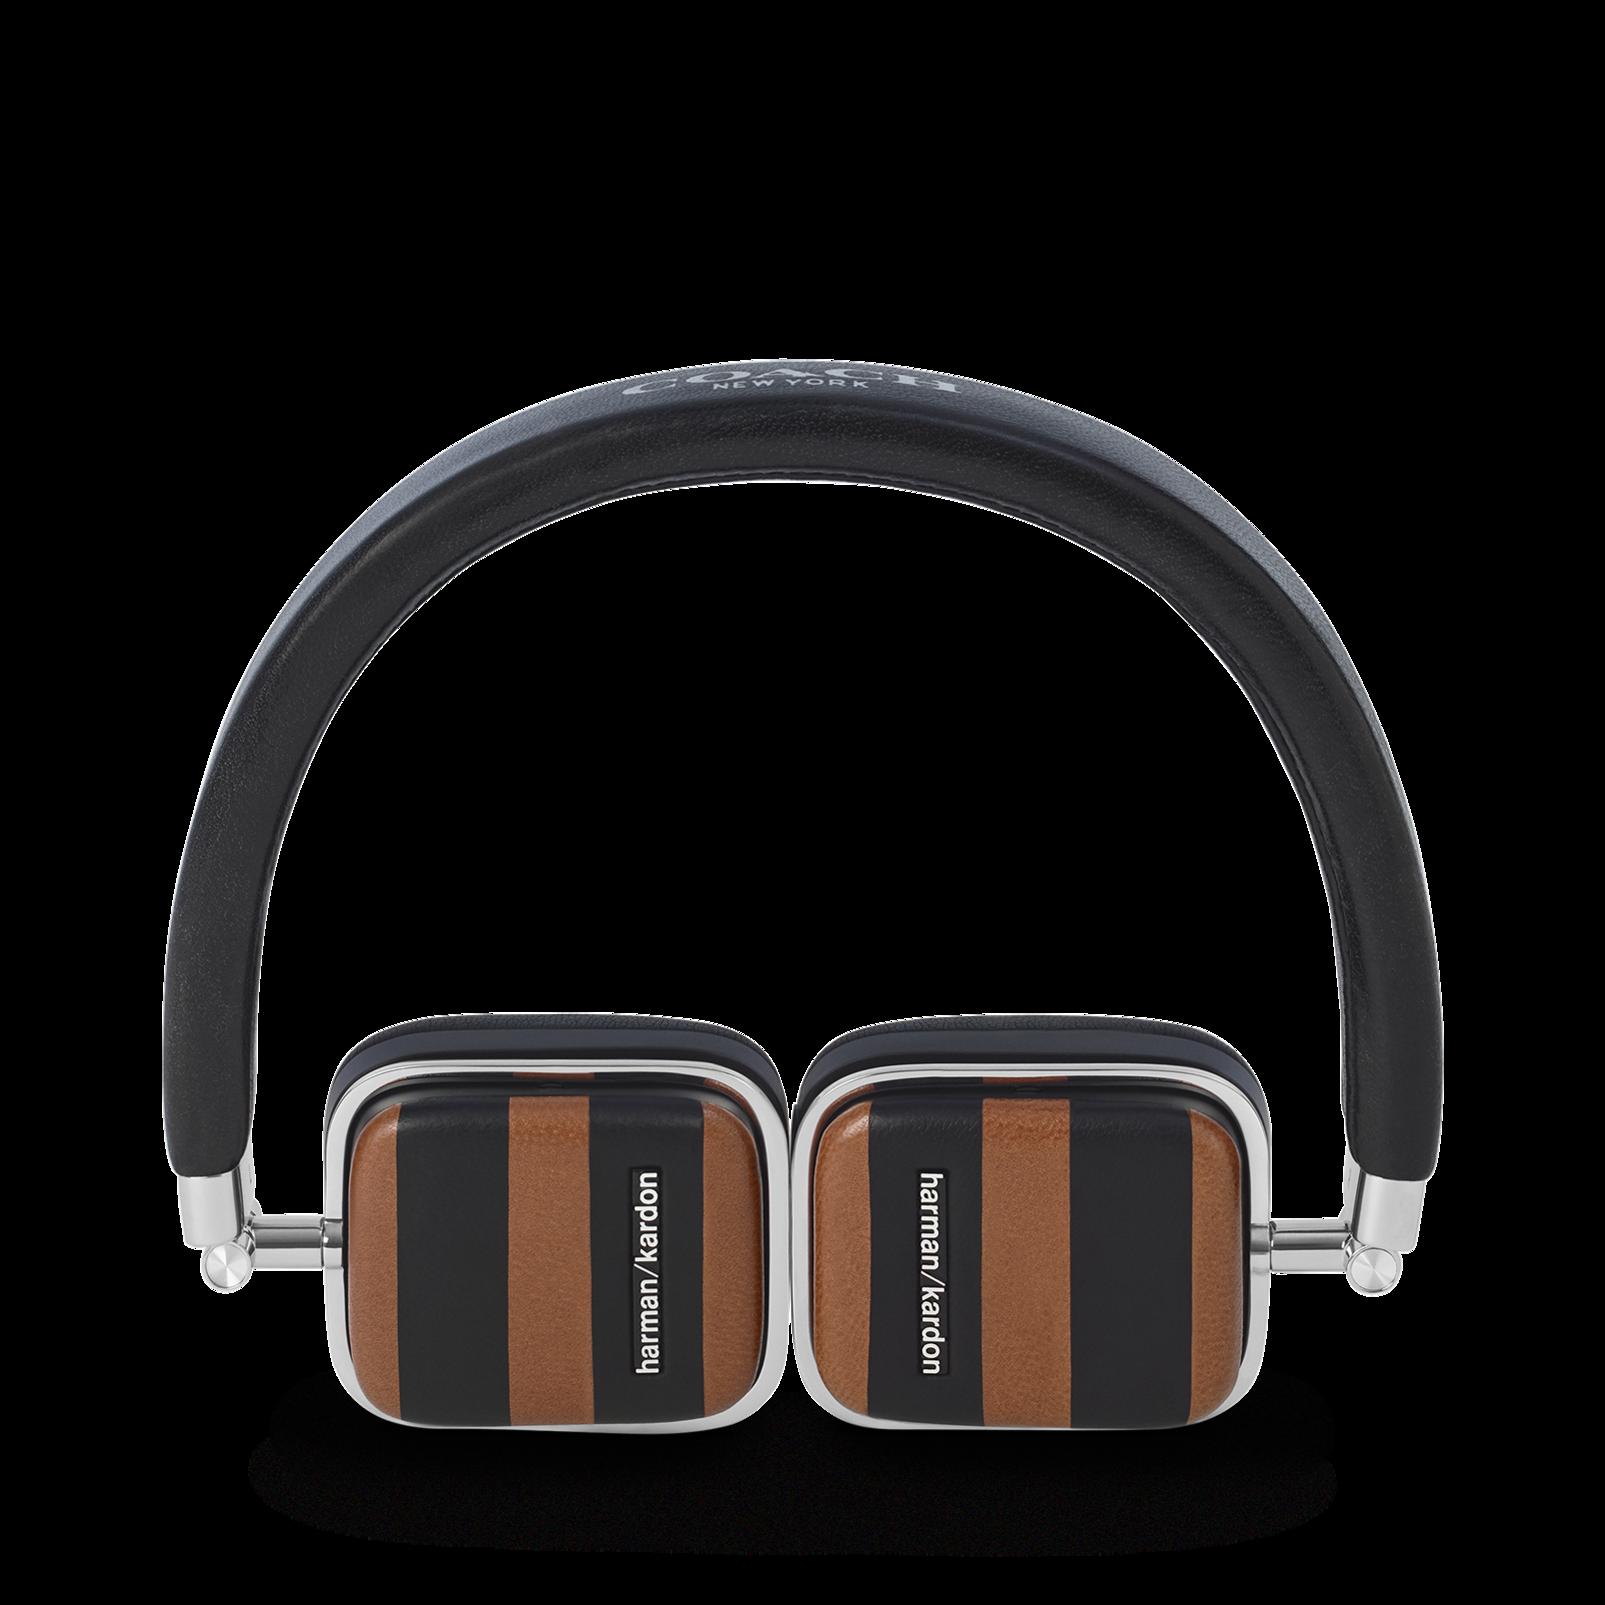 Soho Wireless COACH Limited Edition